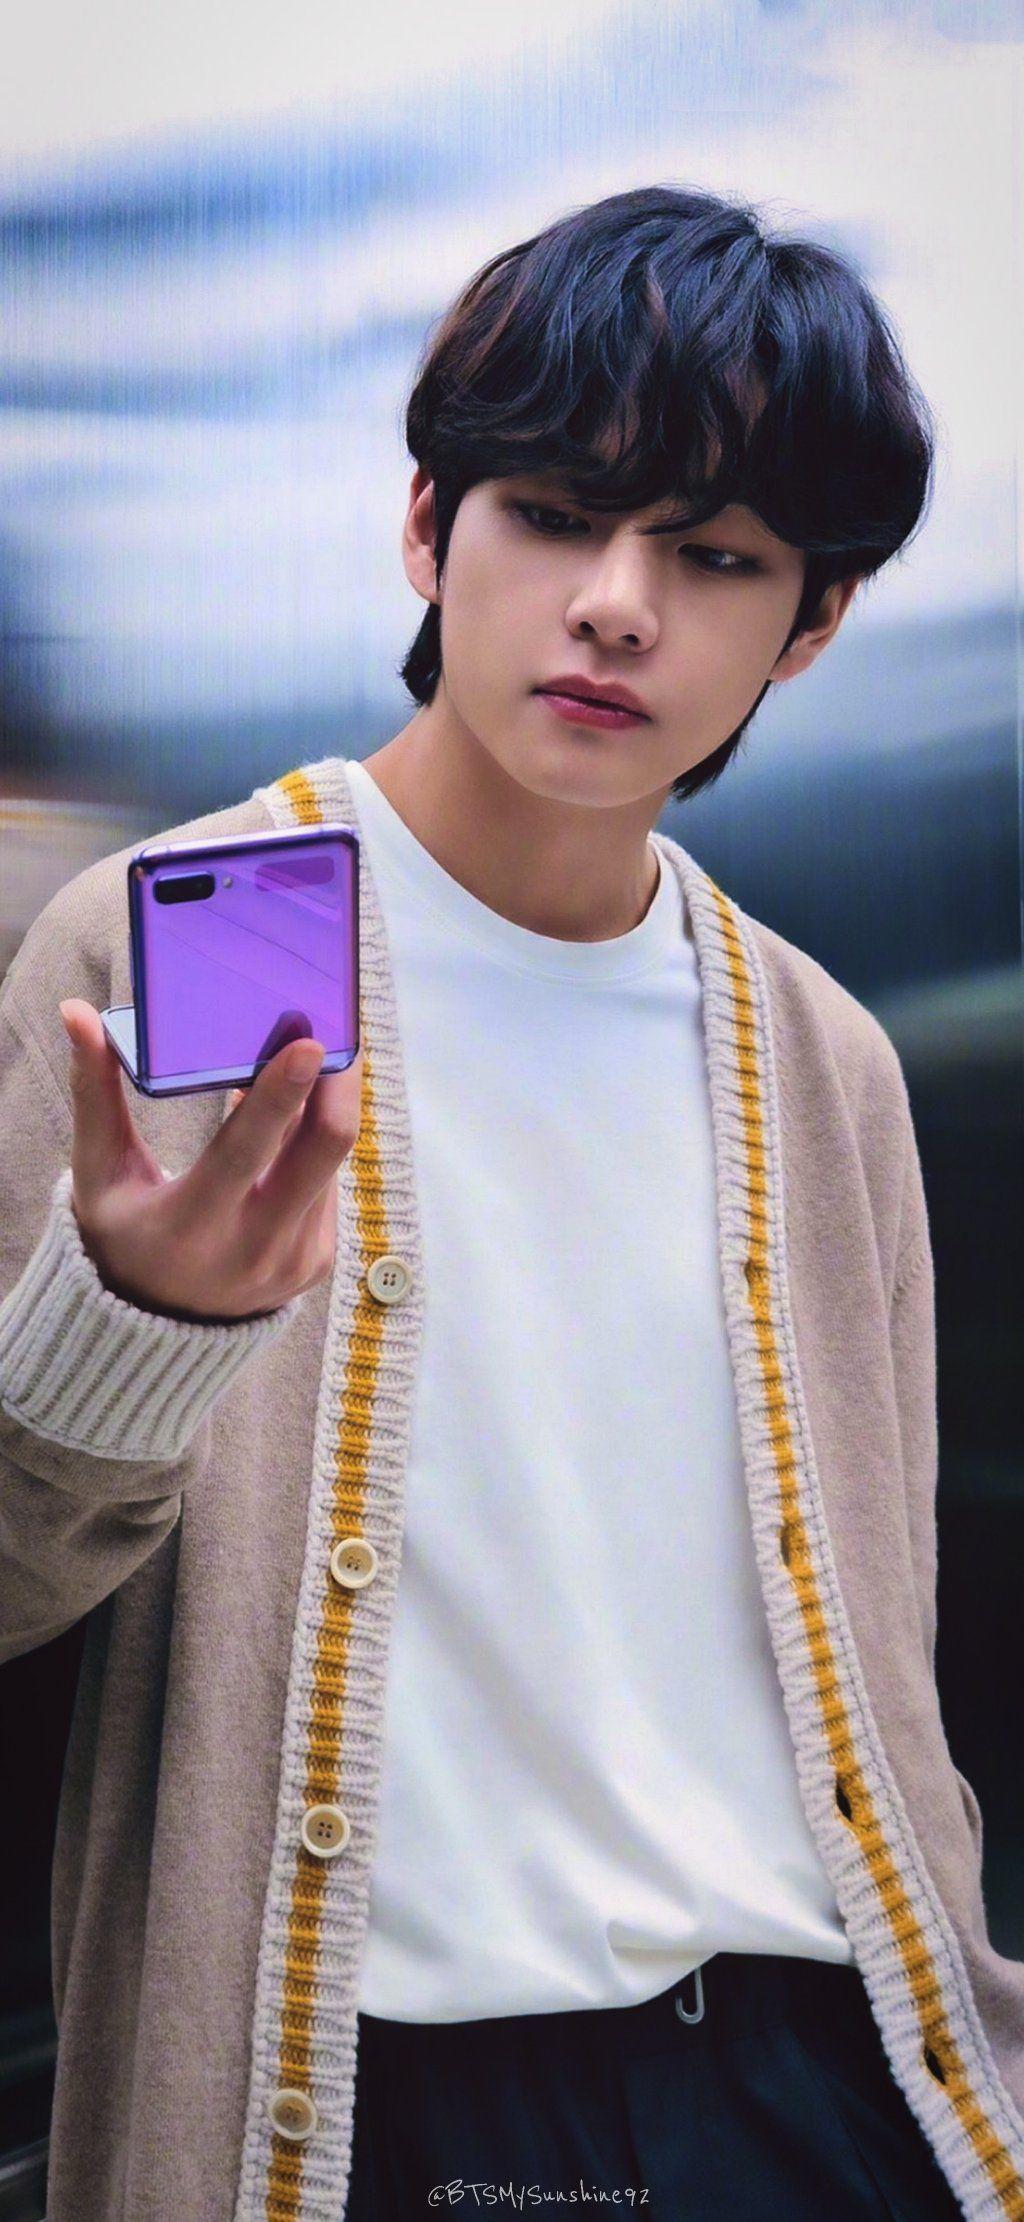 Pin By Angie Romero On Bts Samsung In 2020 Bts Taehyung Taehyung Kim Taehyung